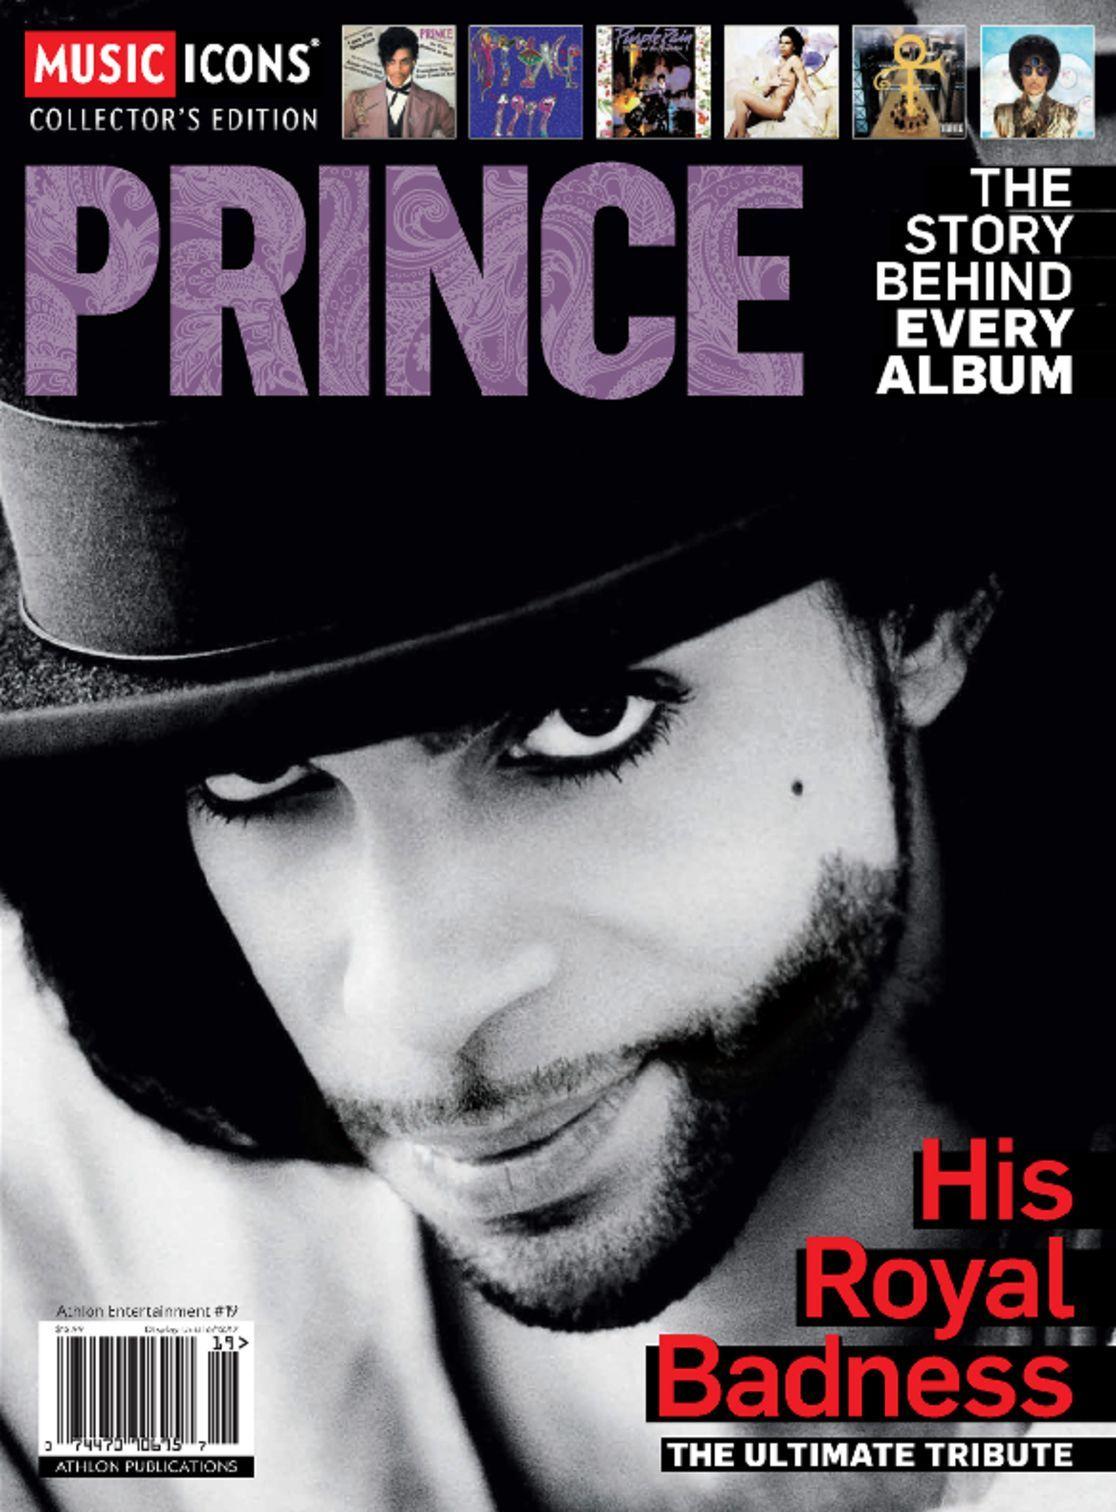 Music Icons Prince Digital